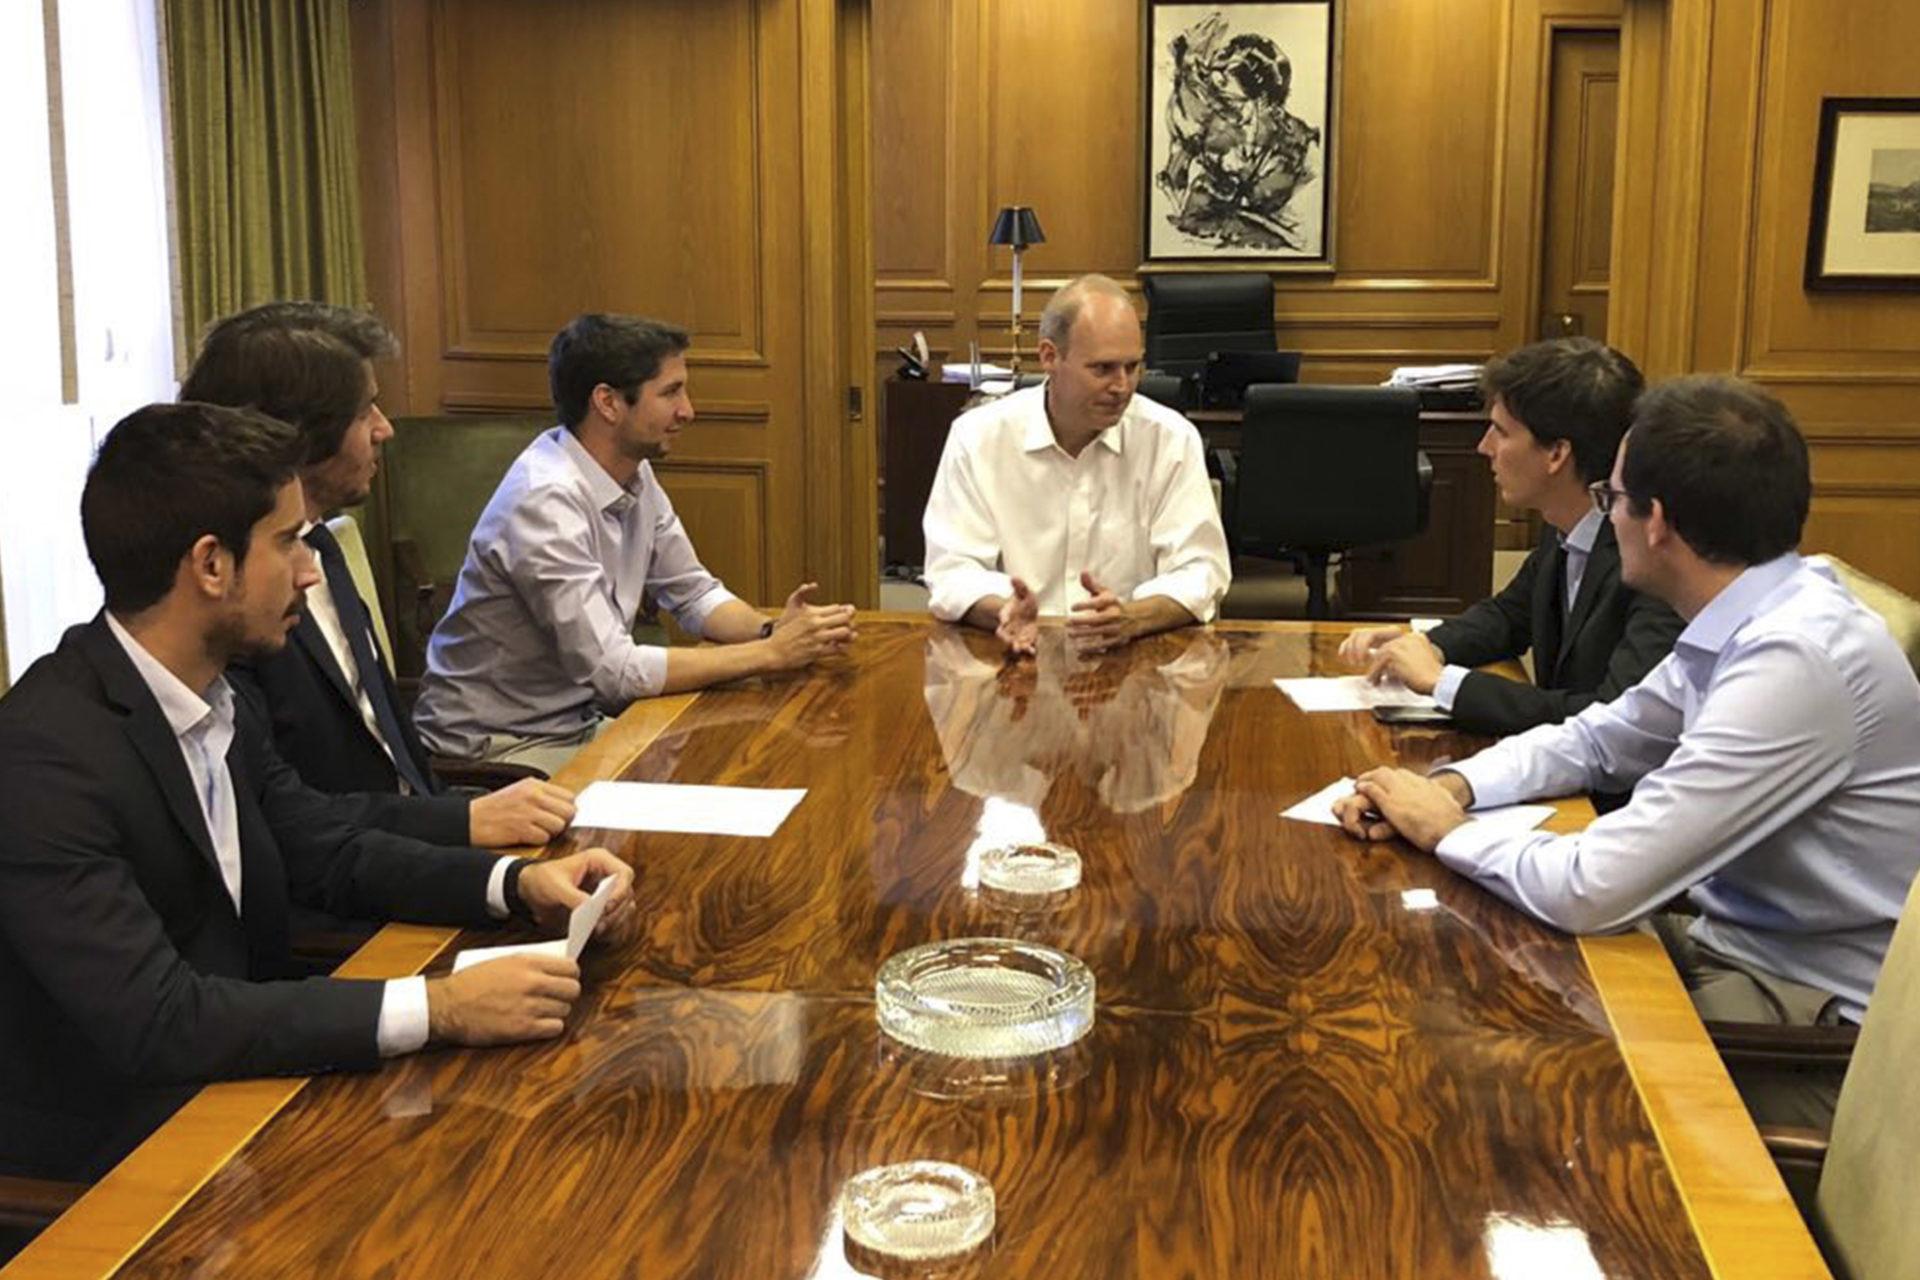 ADEBA Joven se reunió con Javier Bolzico, director  ejecutivo de ADEBA